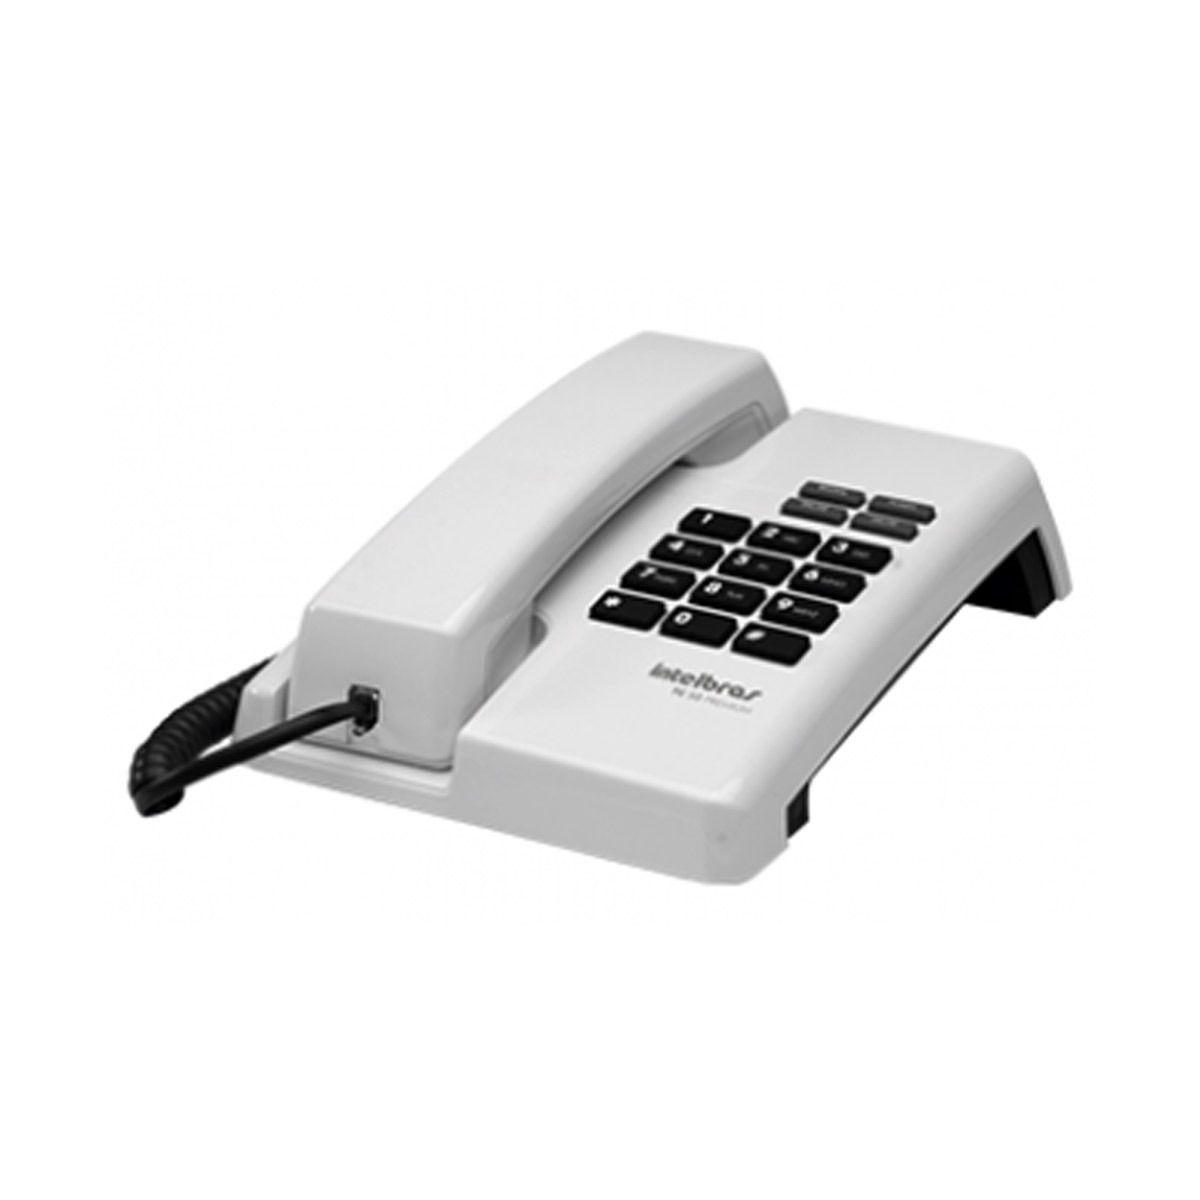 Telefone Intelbras TC 50 Premium Branco